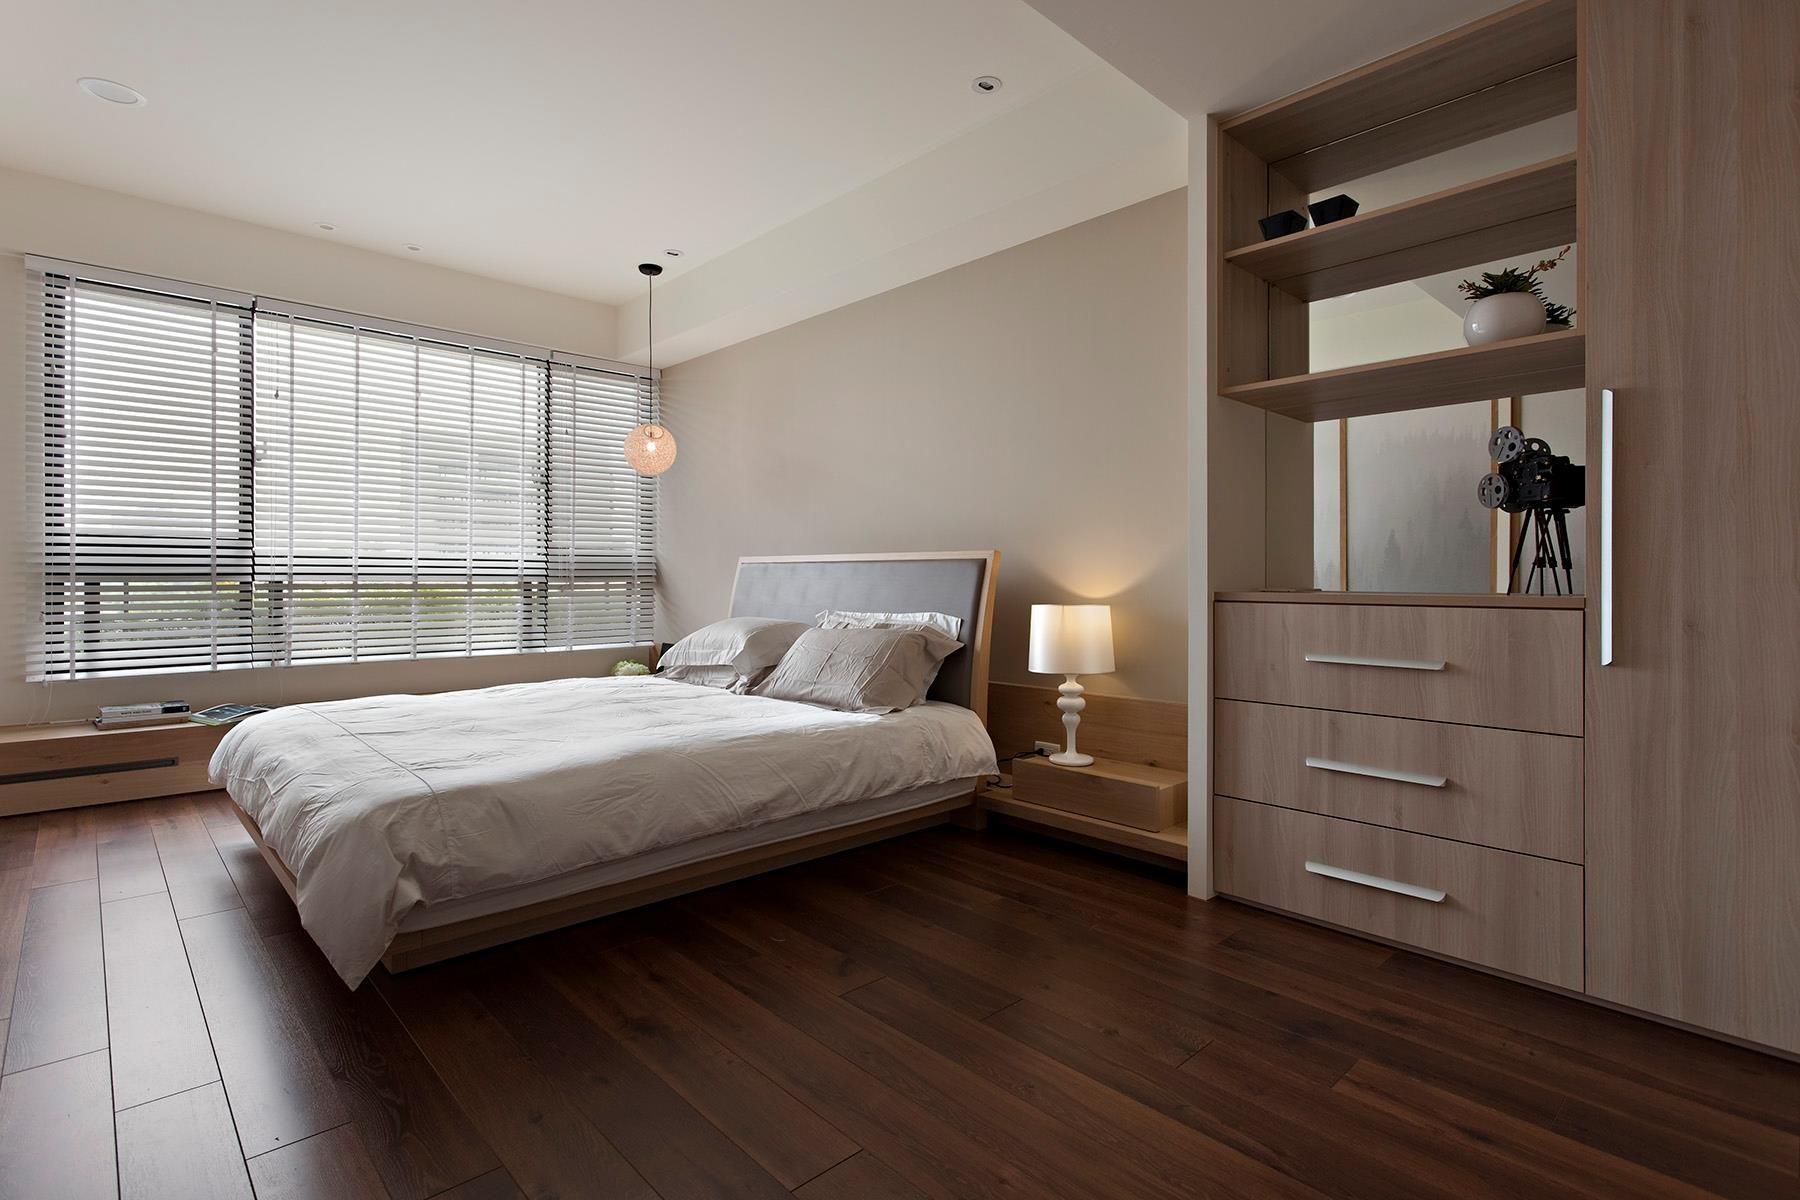 apartment-master-bedroom-with-brown-interior-decoration-ideas-plus